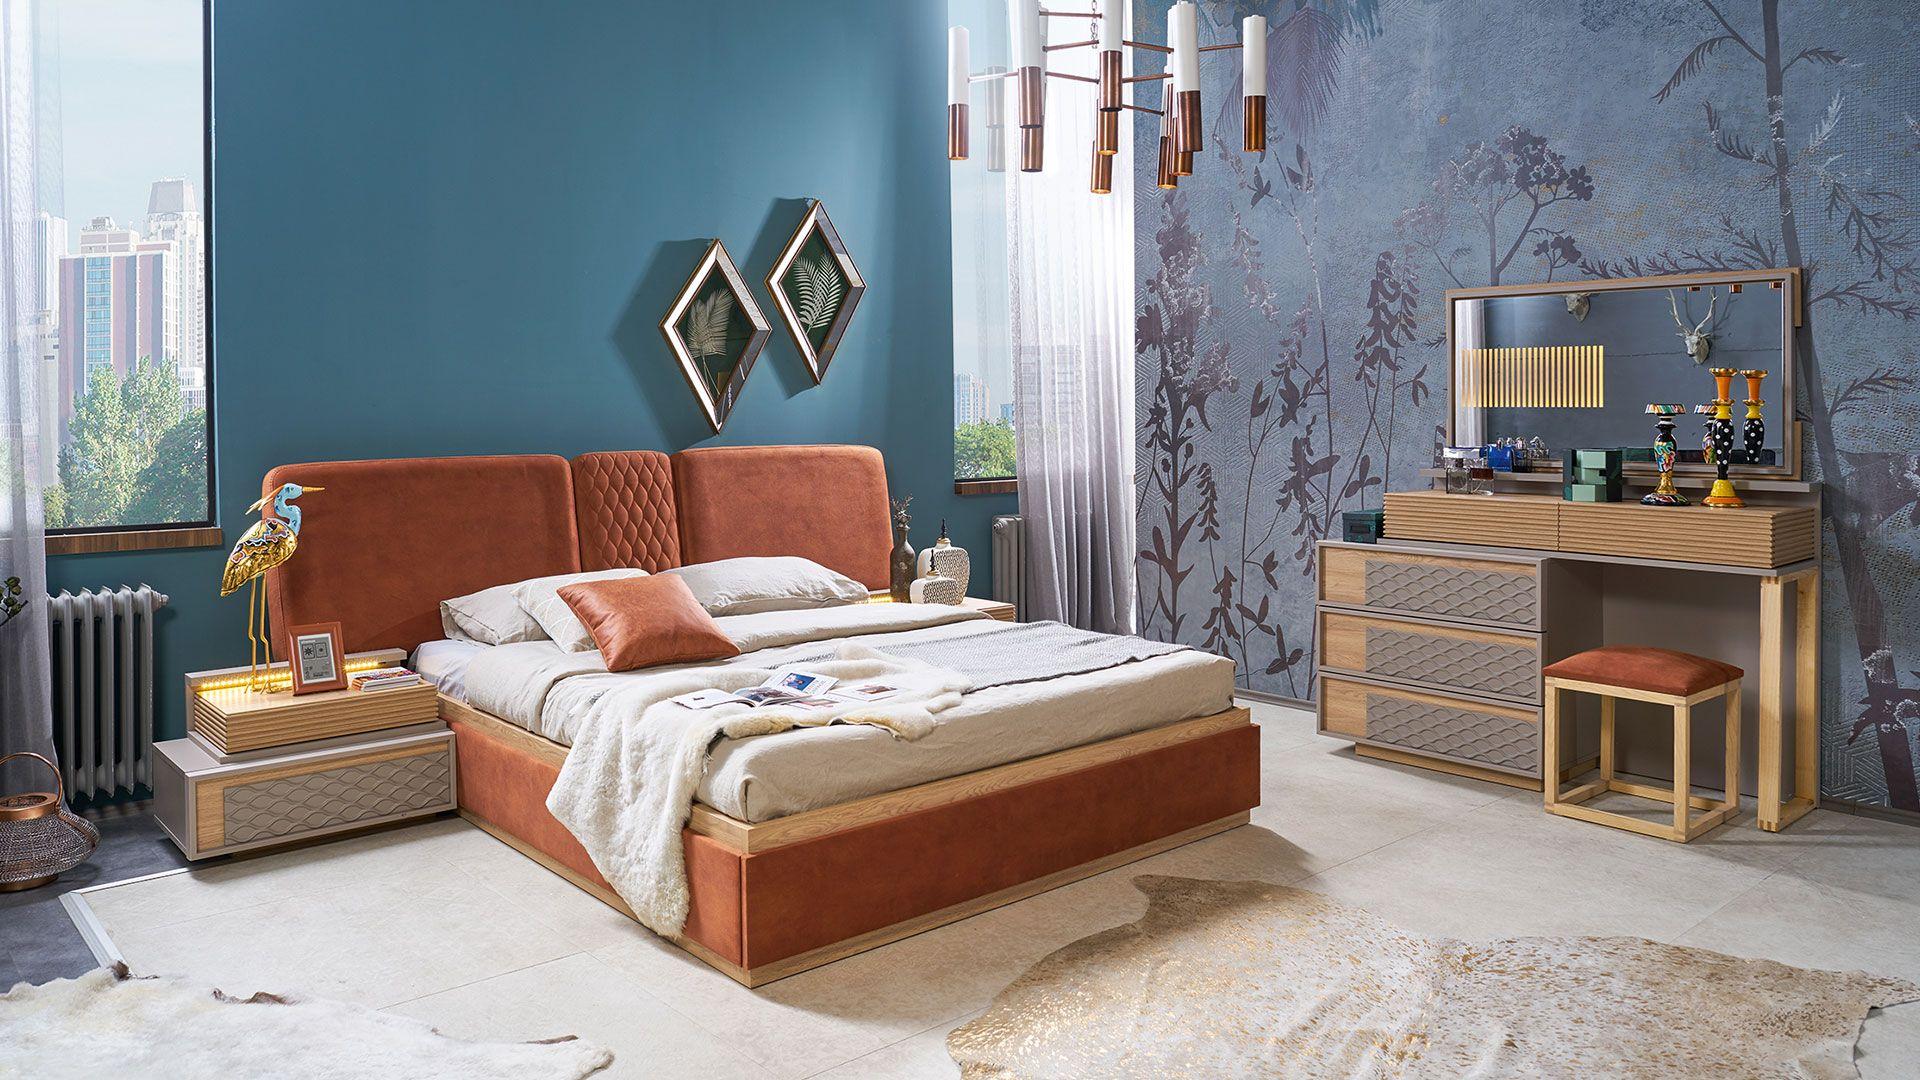 غرفه نوم بوجاتي 2020 فقط وحضريا من اثاث مصر معروضه حاليا بفرع اكتوبر Furniture Bedroom Furniture Home Decor